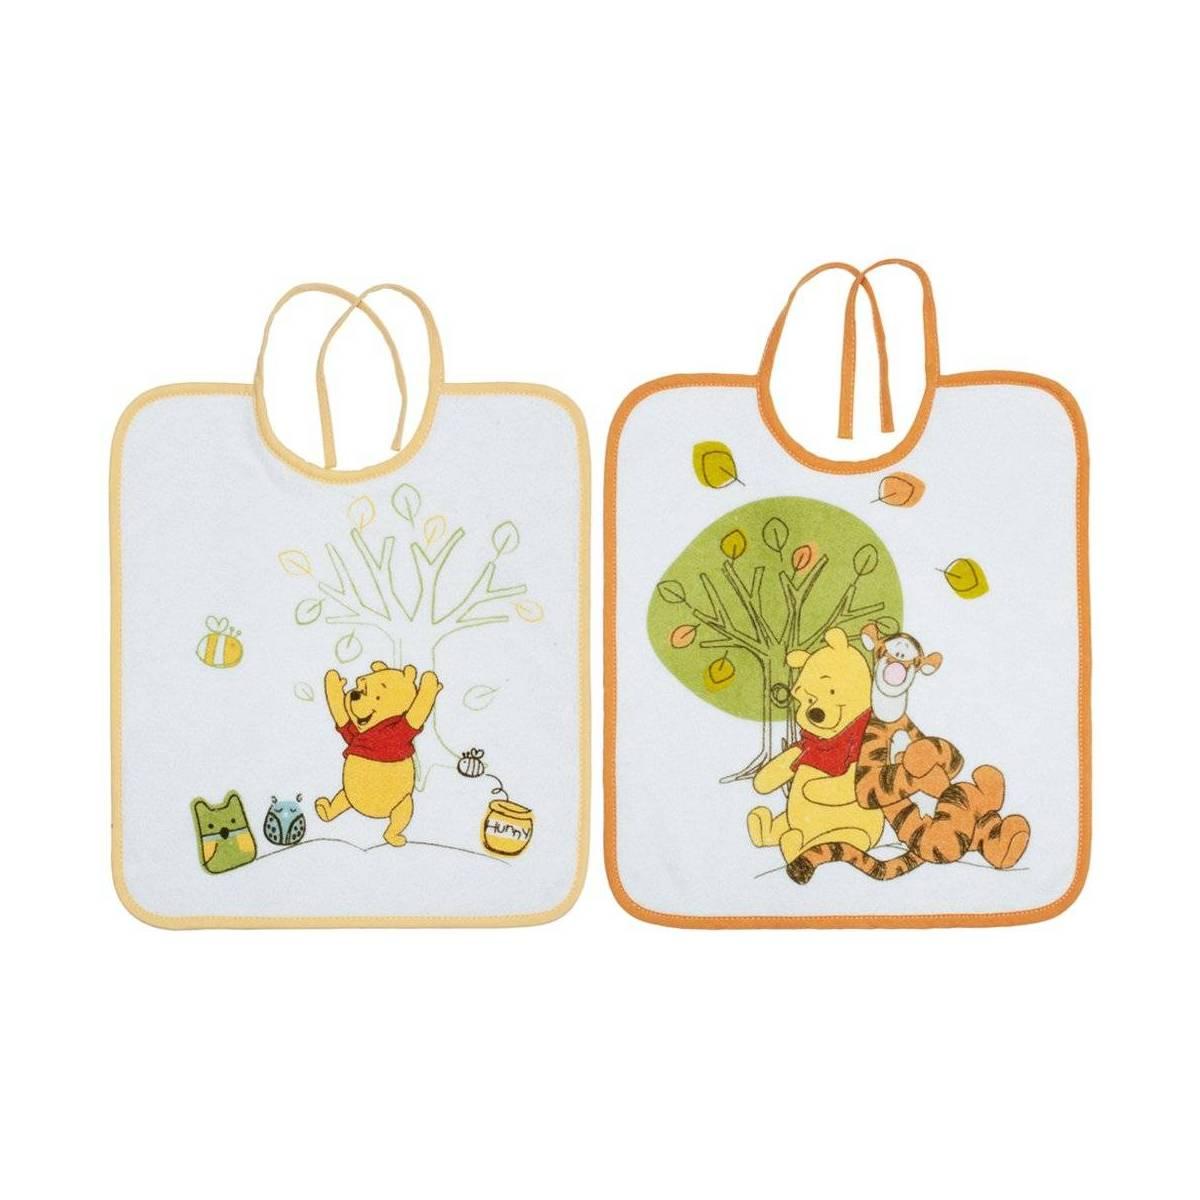 Babycalin - Lot de 2 bavoirs 28x32 cm - Winnie Doodle Craft